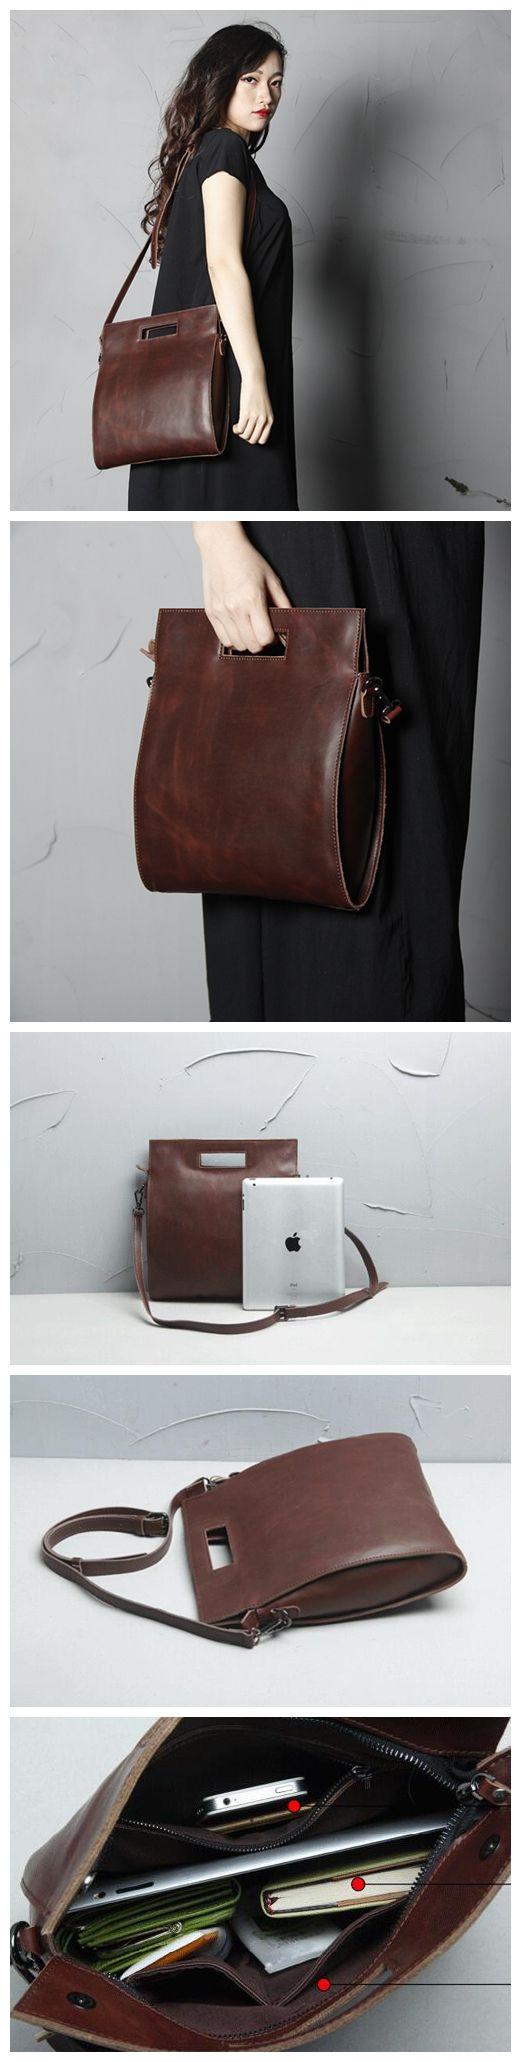 HANDMADE FULL GRAIN LEATHER WOMEN SATCHEL SHOULDER BAG HANDBAG WOMEN 'S FASHION BAG HANDMADE LADY'S BAG